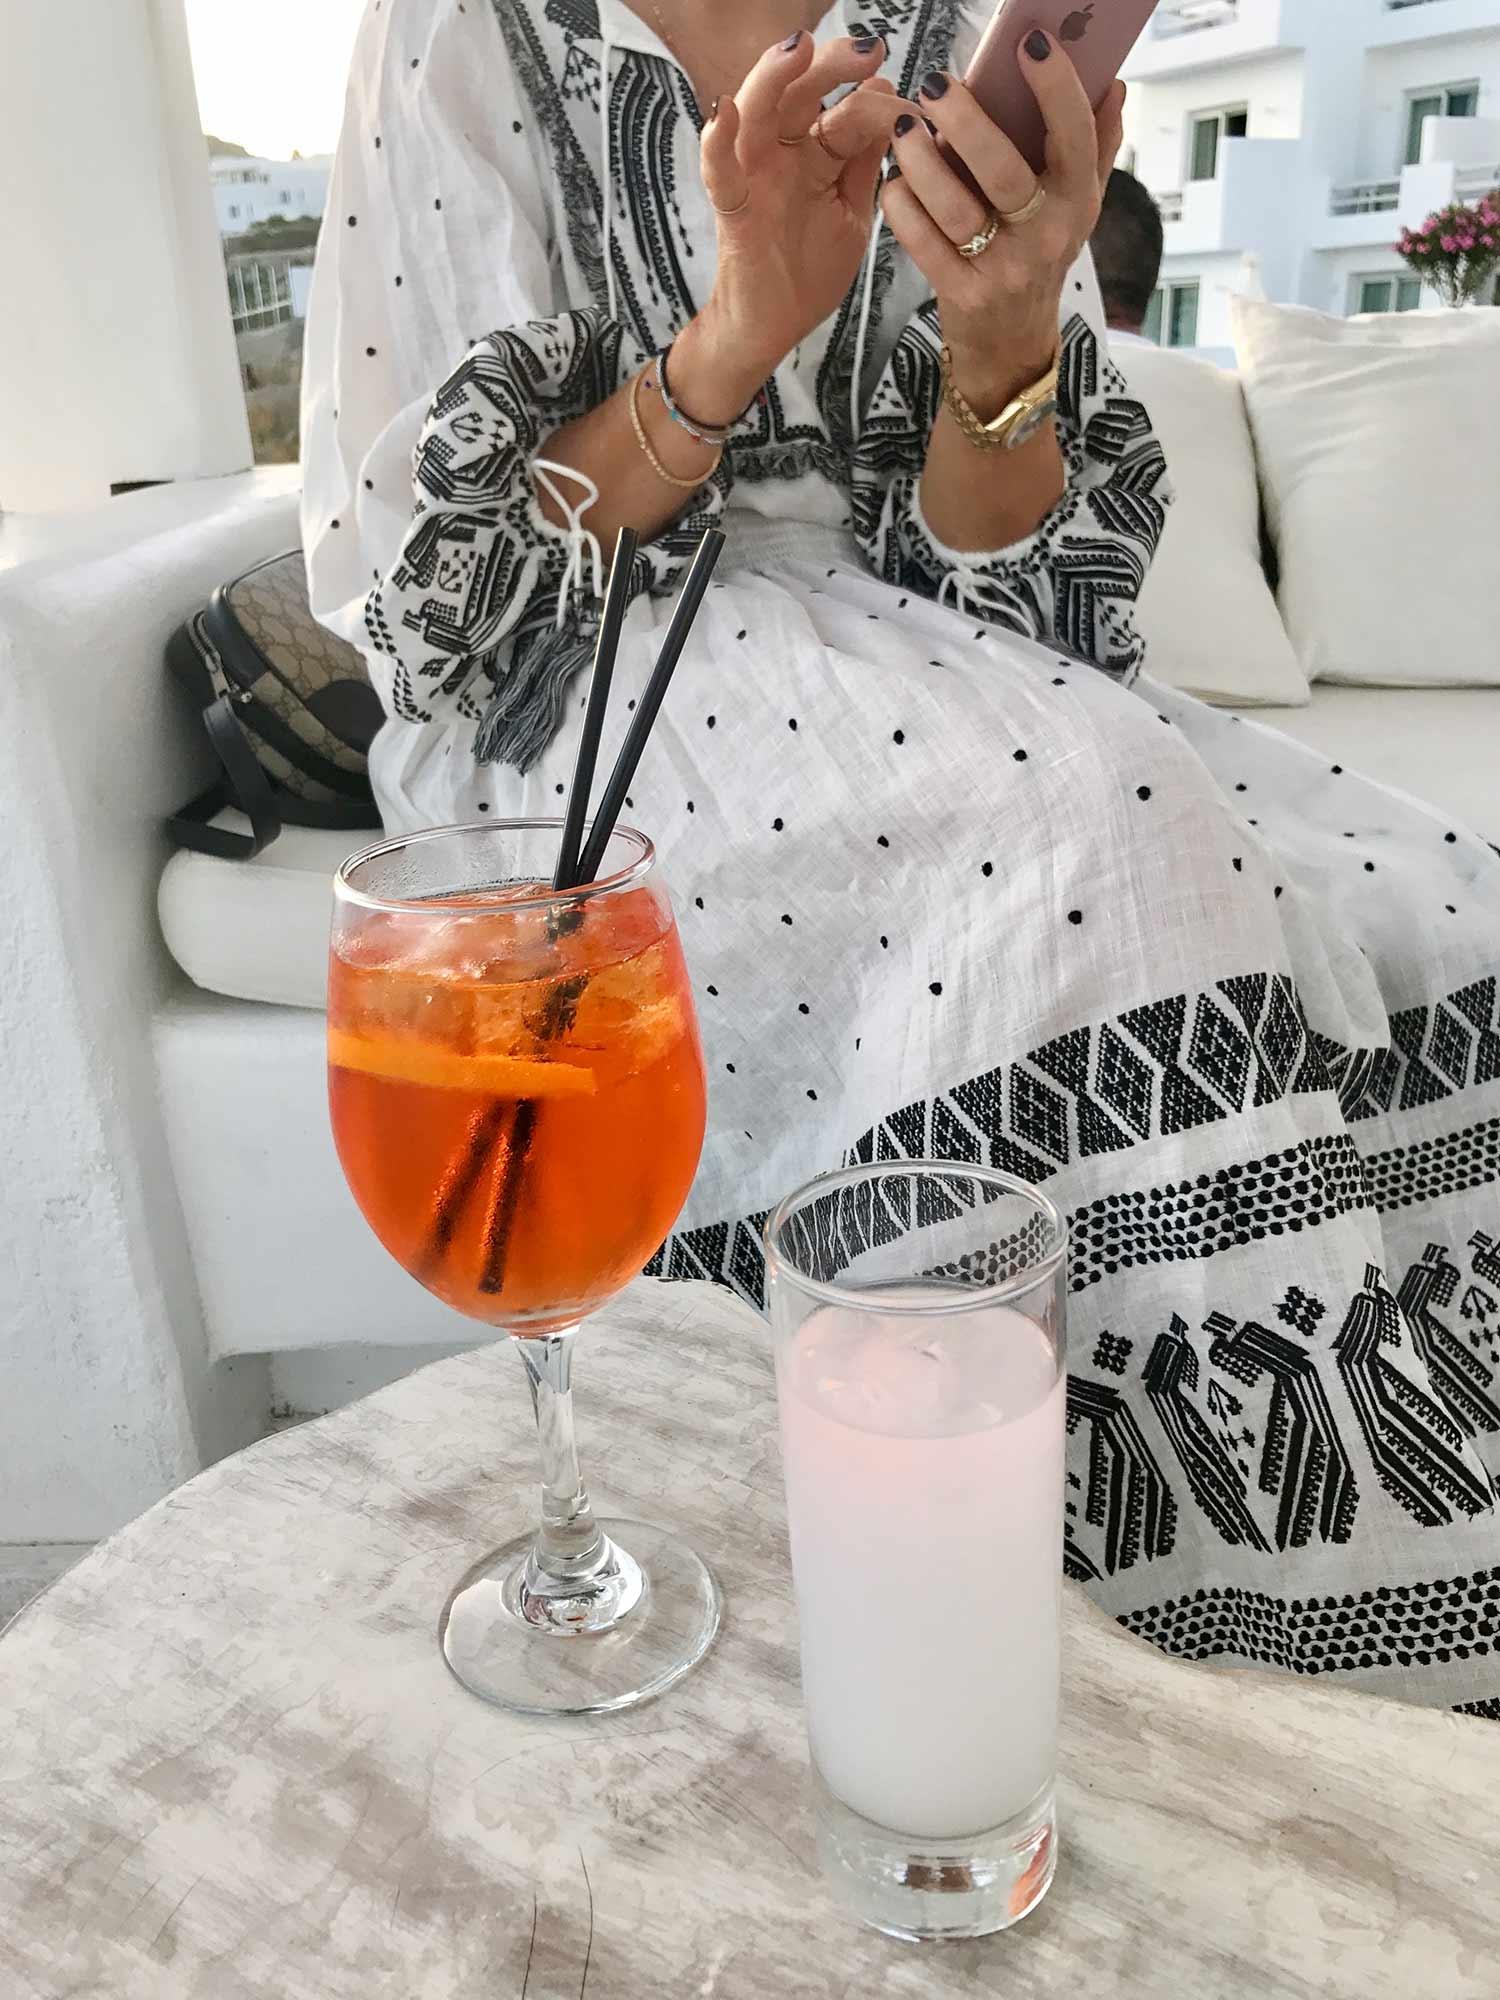 Enjoying an afternoon spritz. July 2017